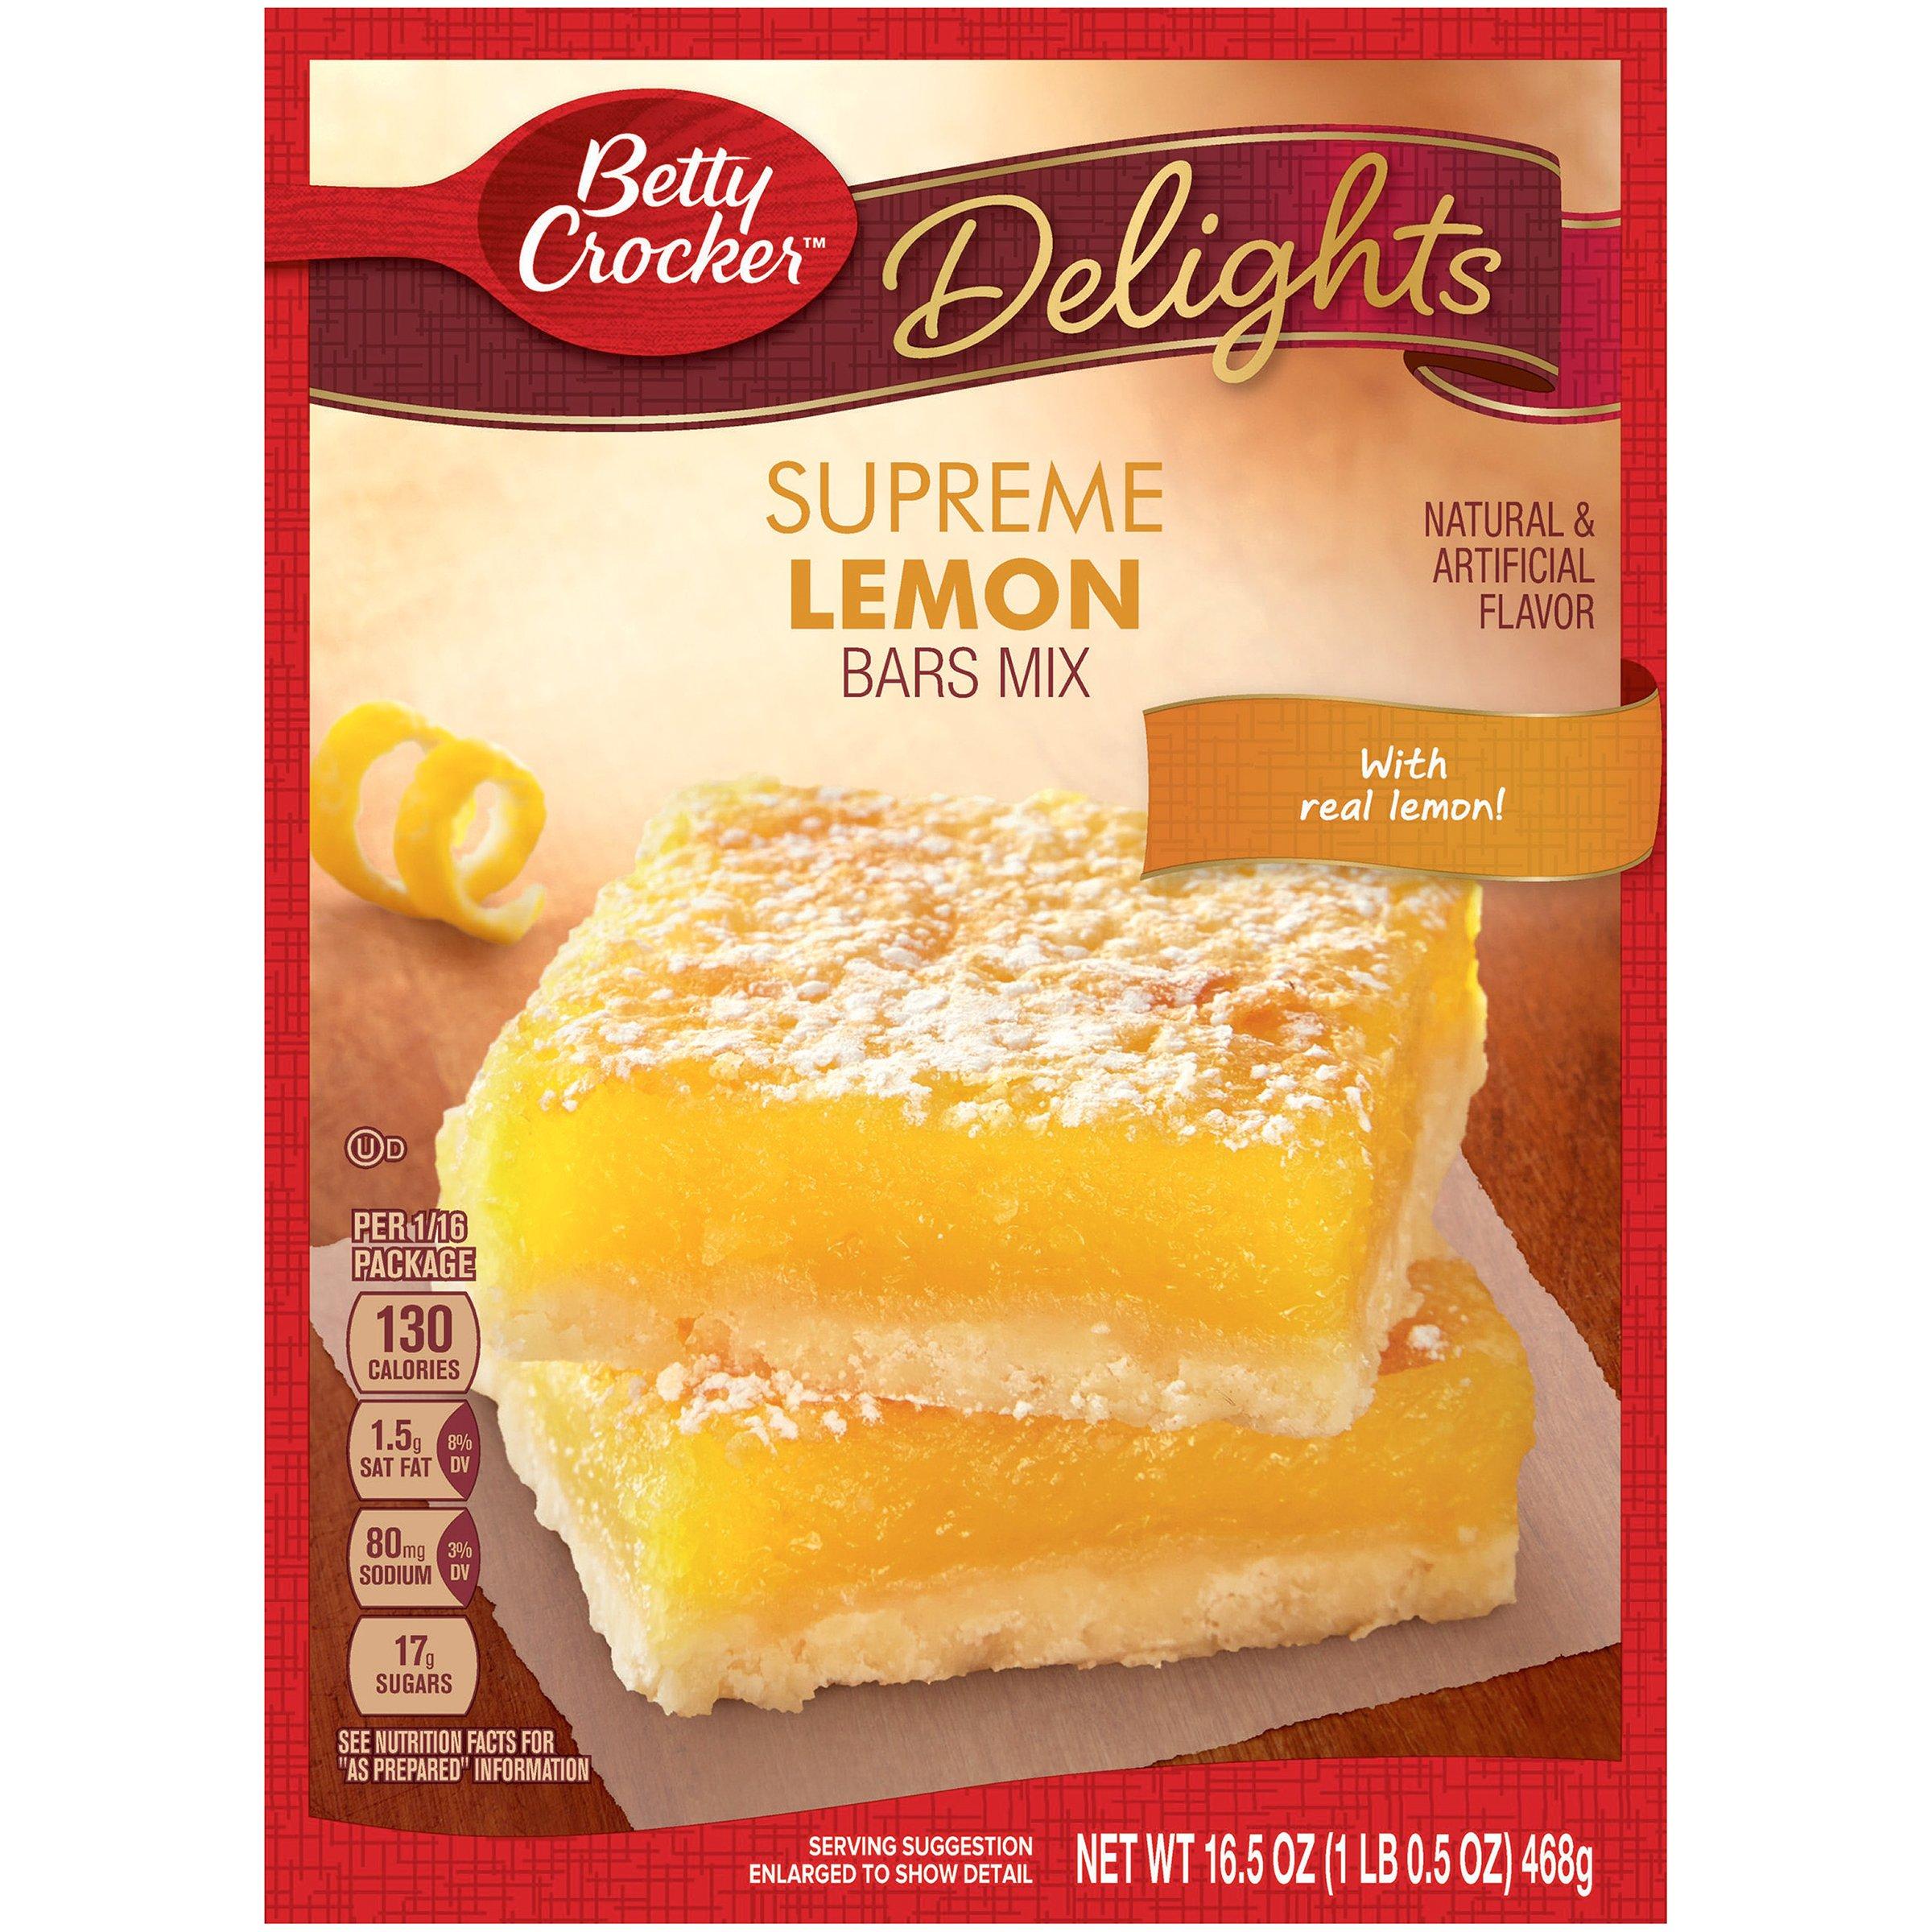 Betty Crocker Delights, Supreme Lemon Bars Baking Mix, 16.5 Oz Box (Pack of 12)